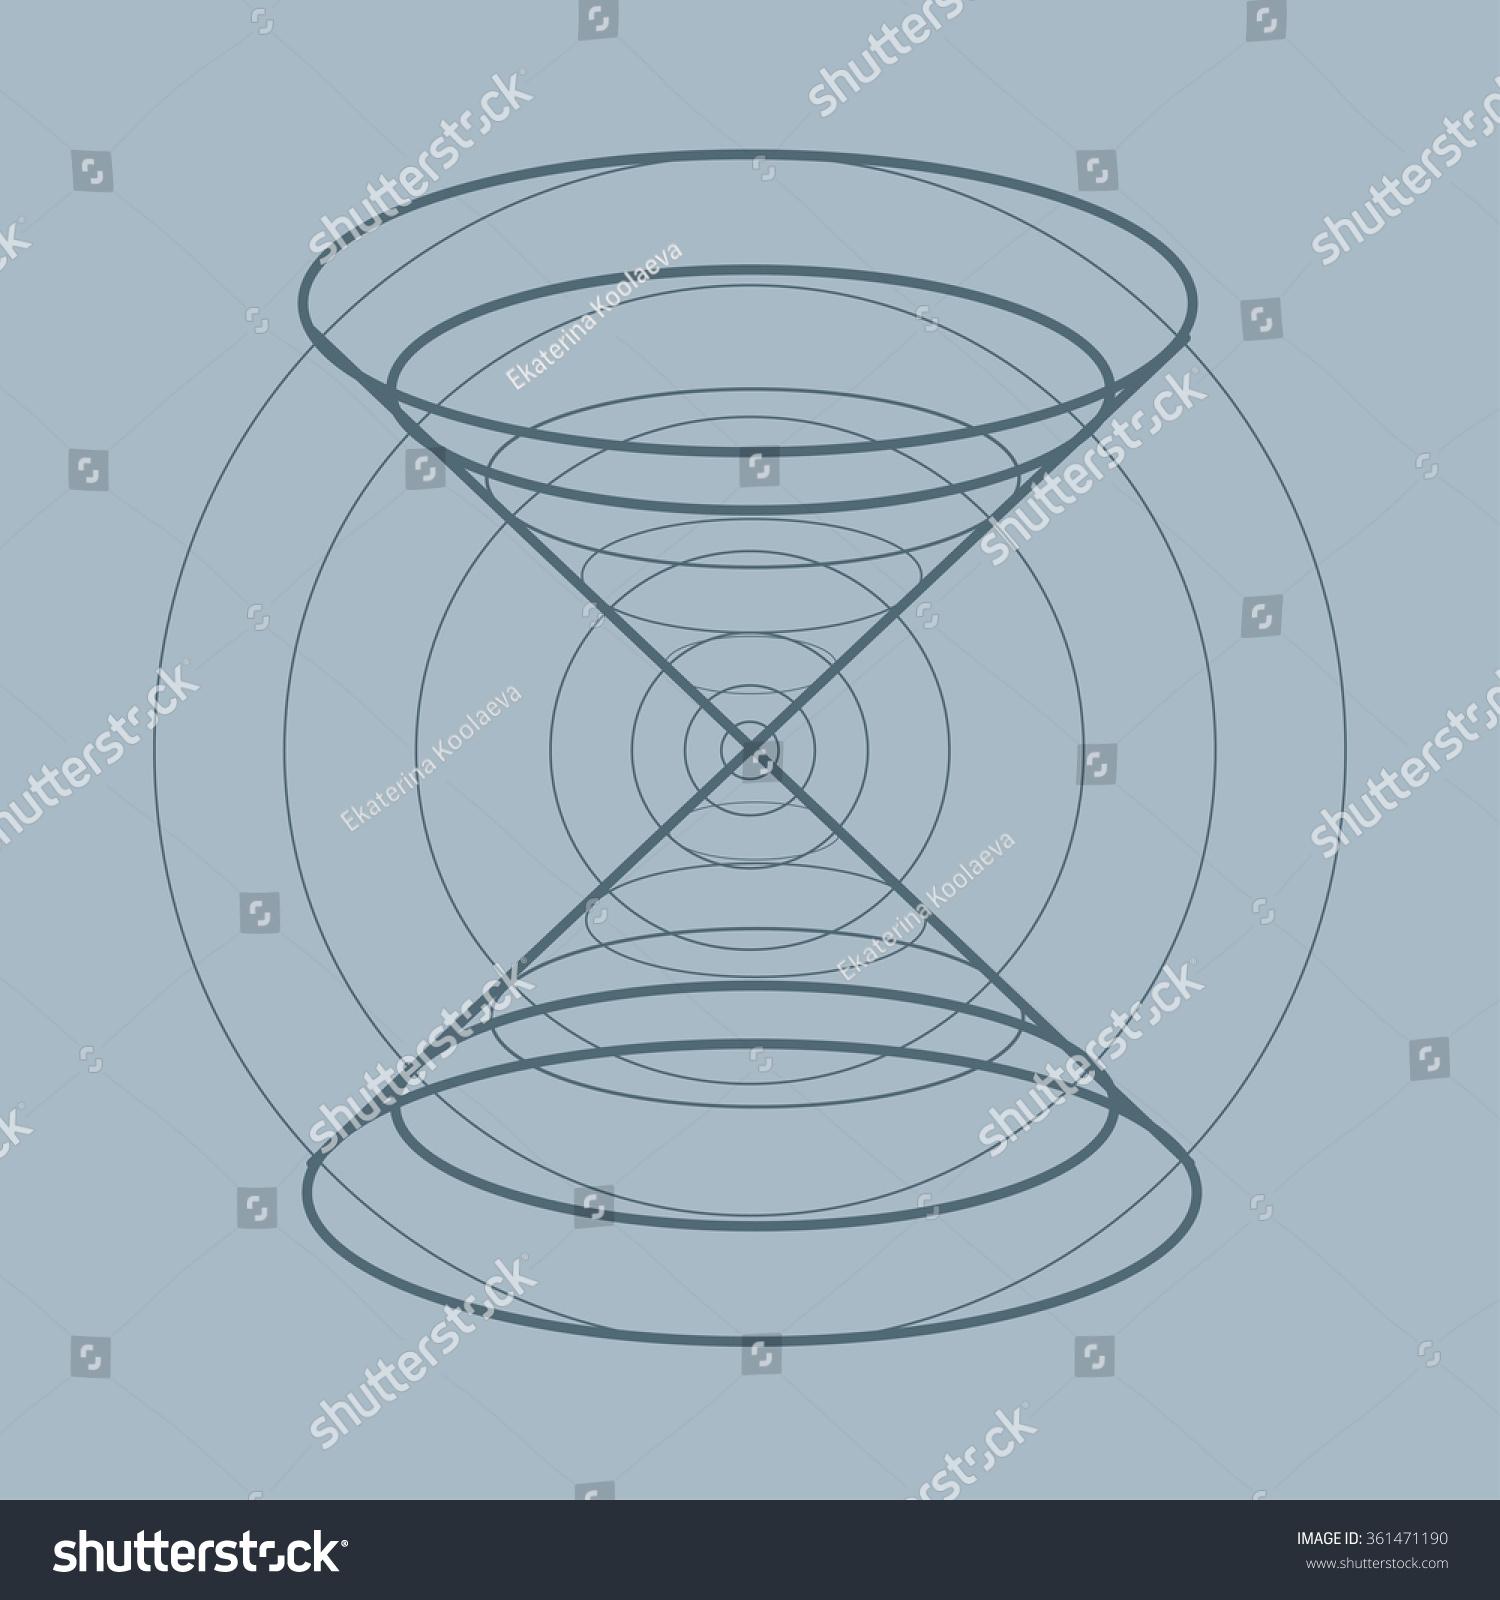 Sacred geometry symbol element alchemy religion stock vector sacred geometry symbol or element alchemy religion philosophy astrology and spirituality themes biocorpaavc